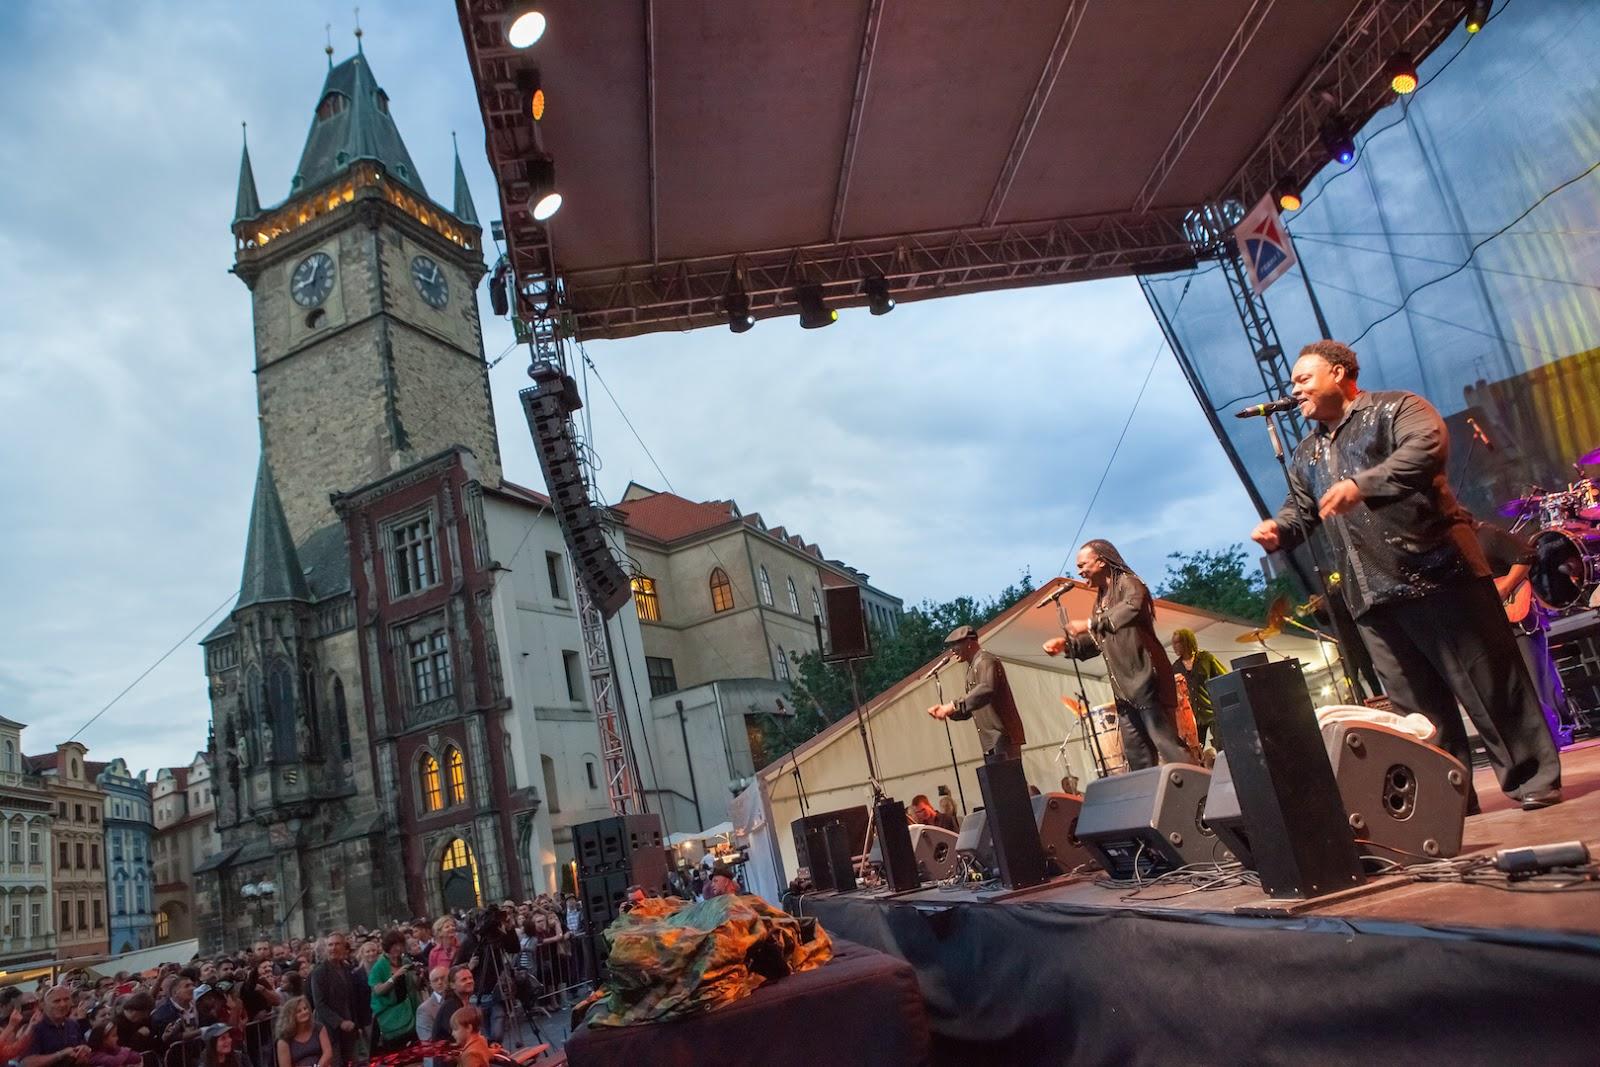 JBL VTX V20 Line Arrays Bohemia Jazz Fest